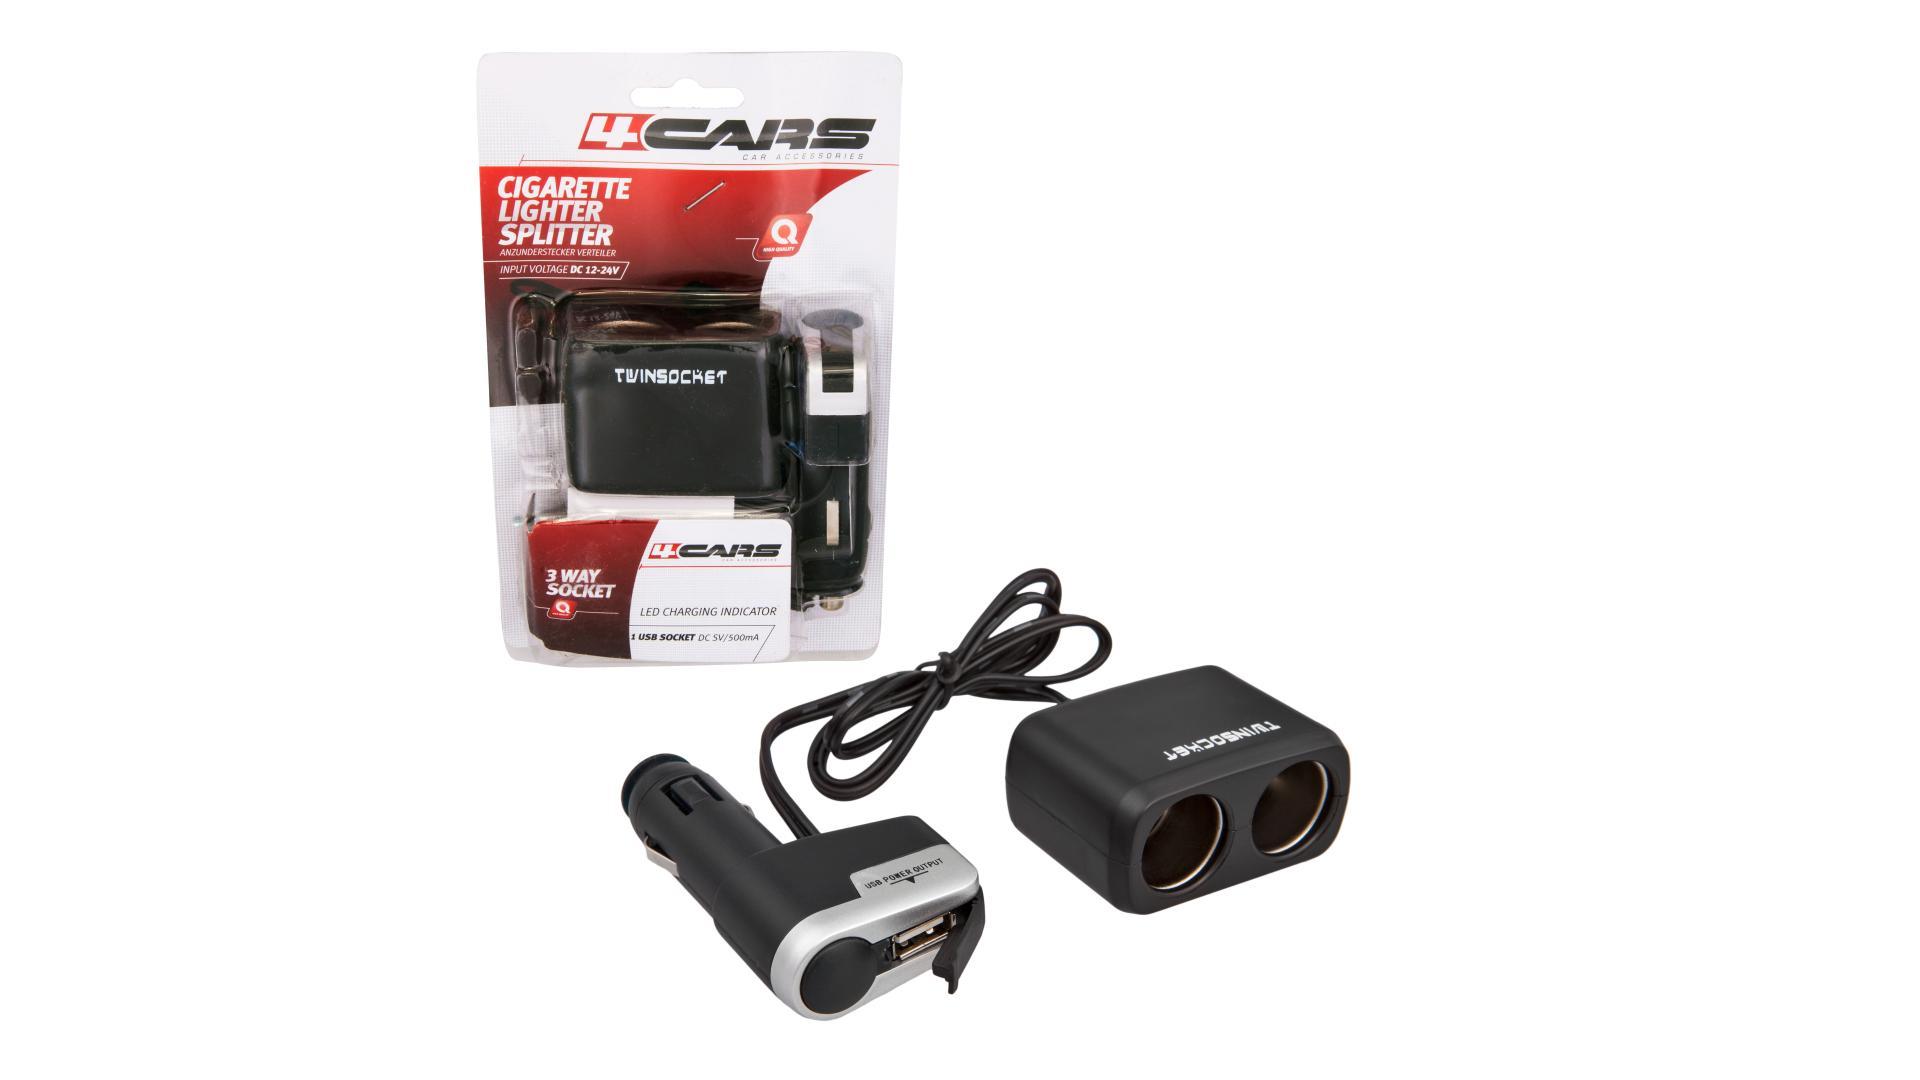 4CARS Rozdvojka zapalovače 12/24V S USB